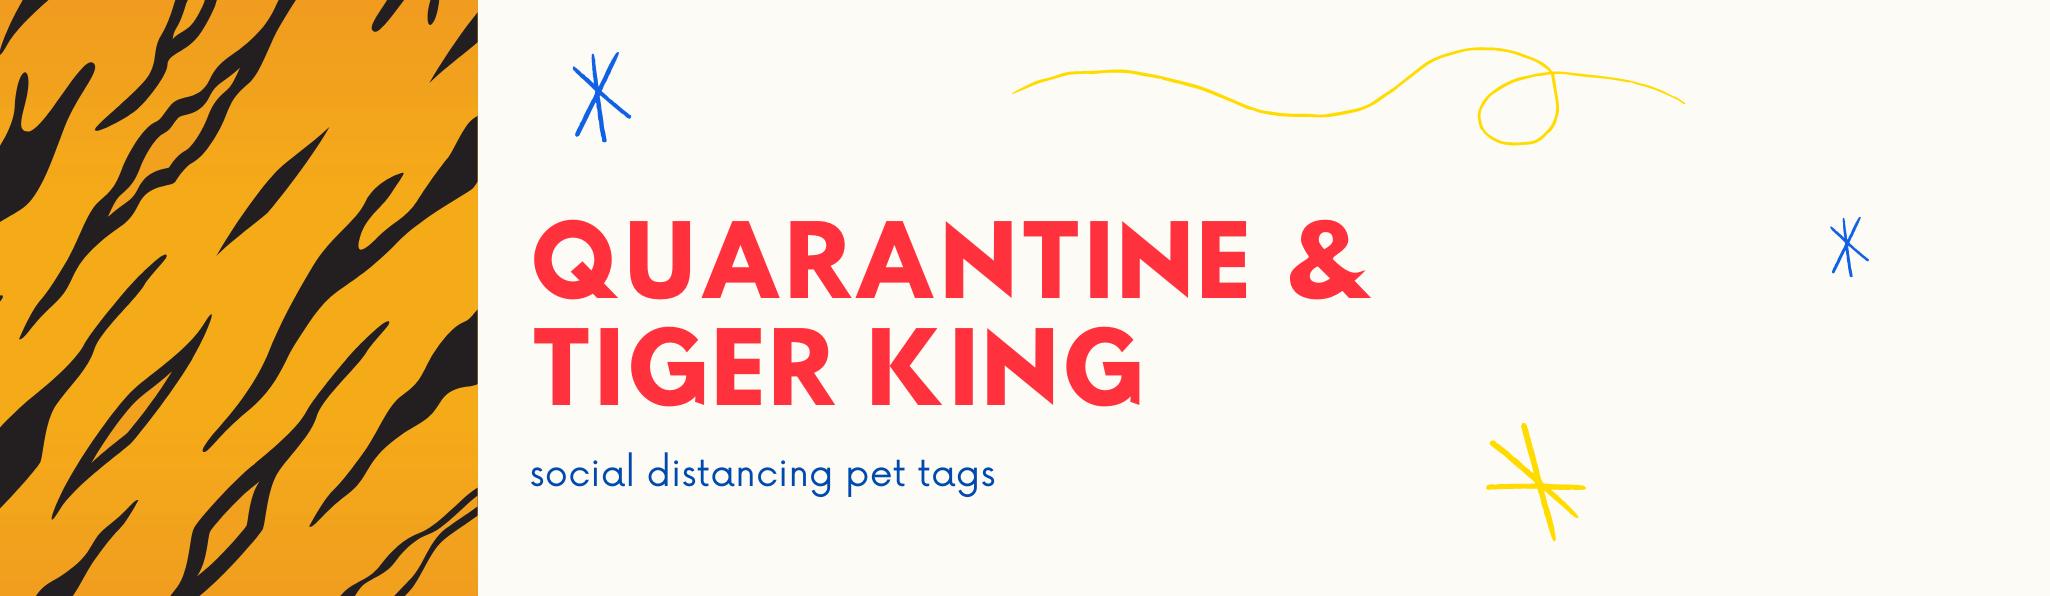 tiger-king-banner.png